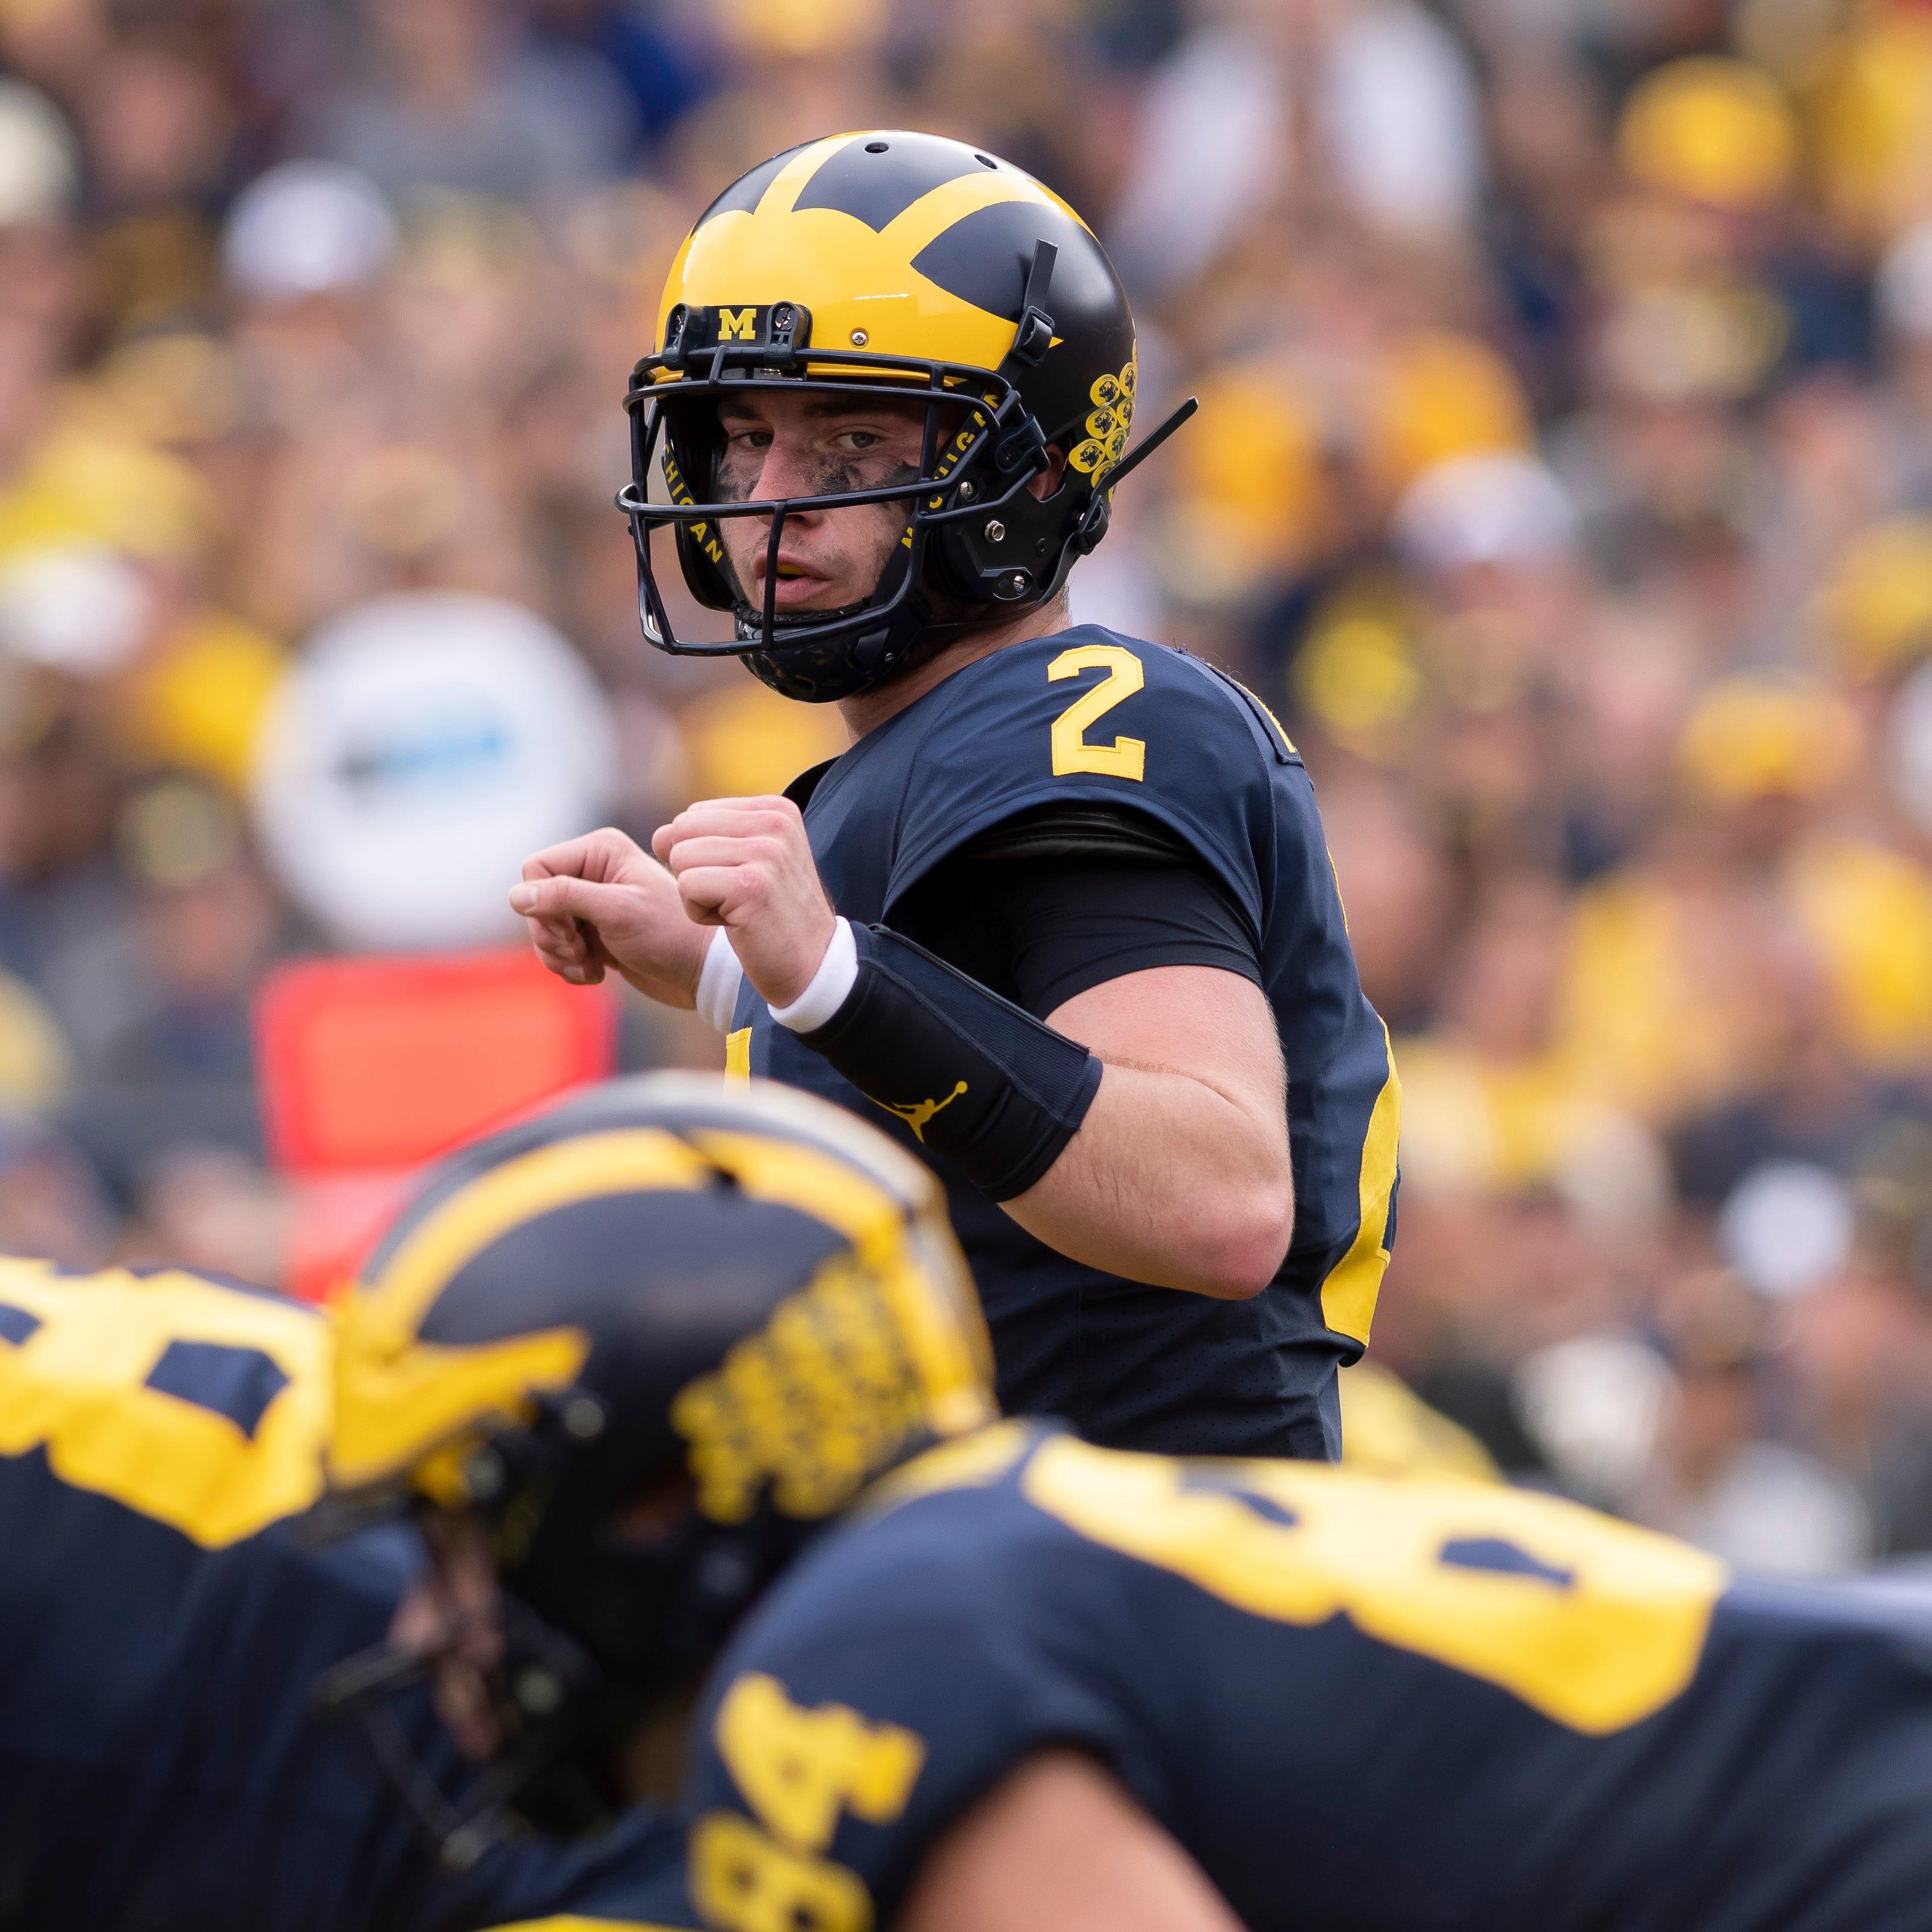 Patterson paves winning way for 'playoff ready' Michigan